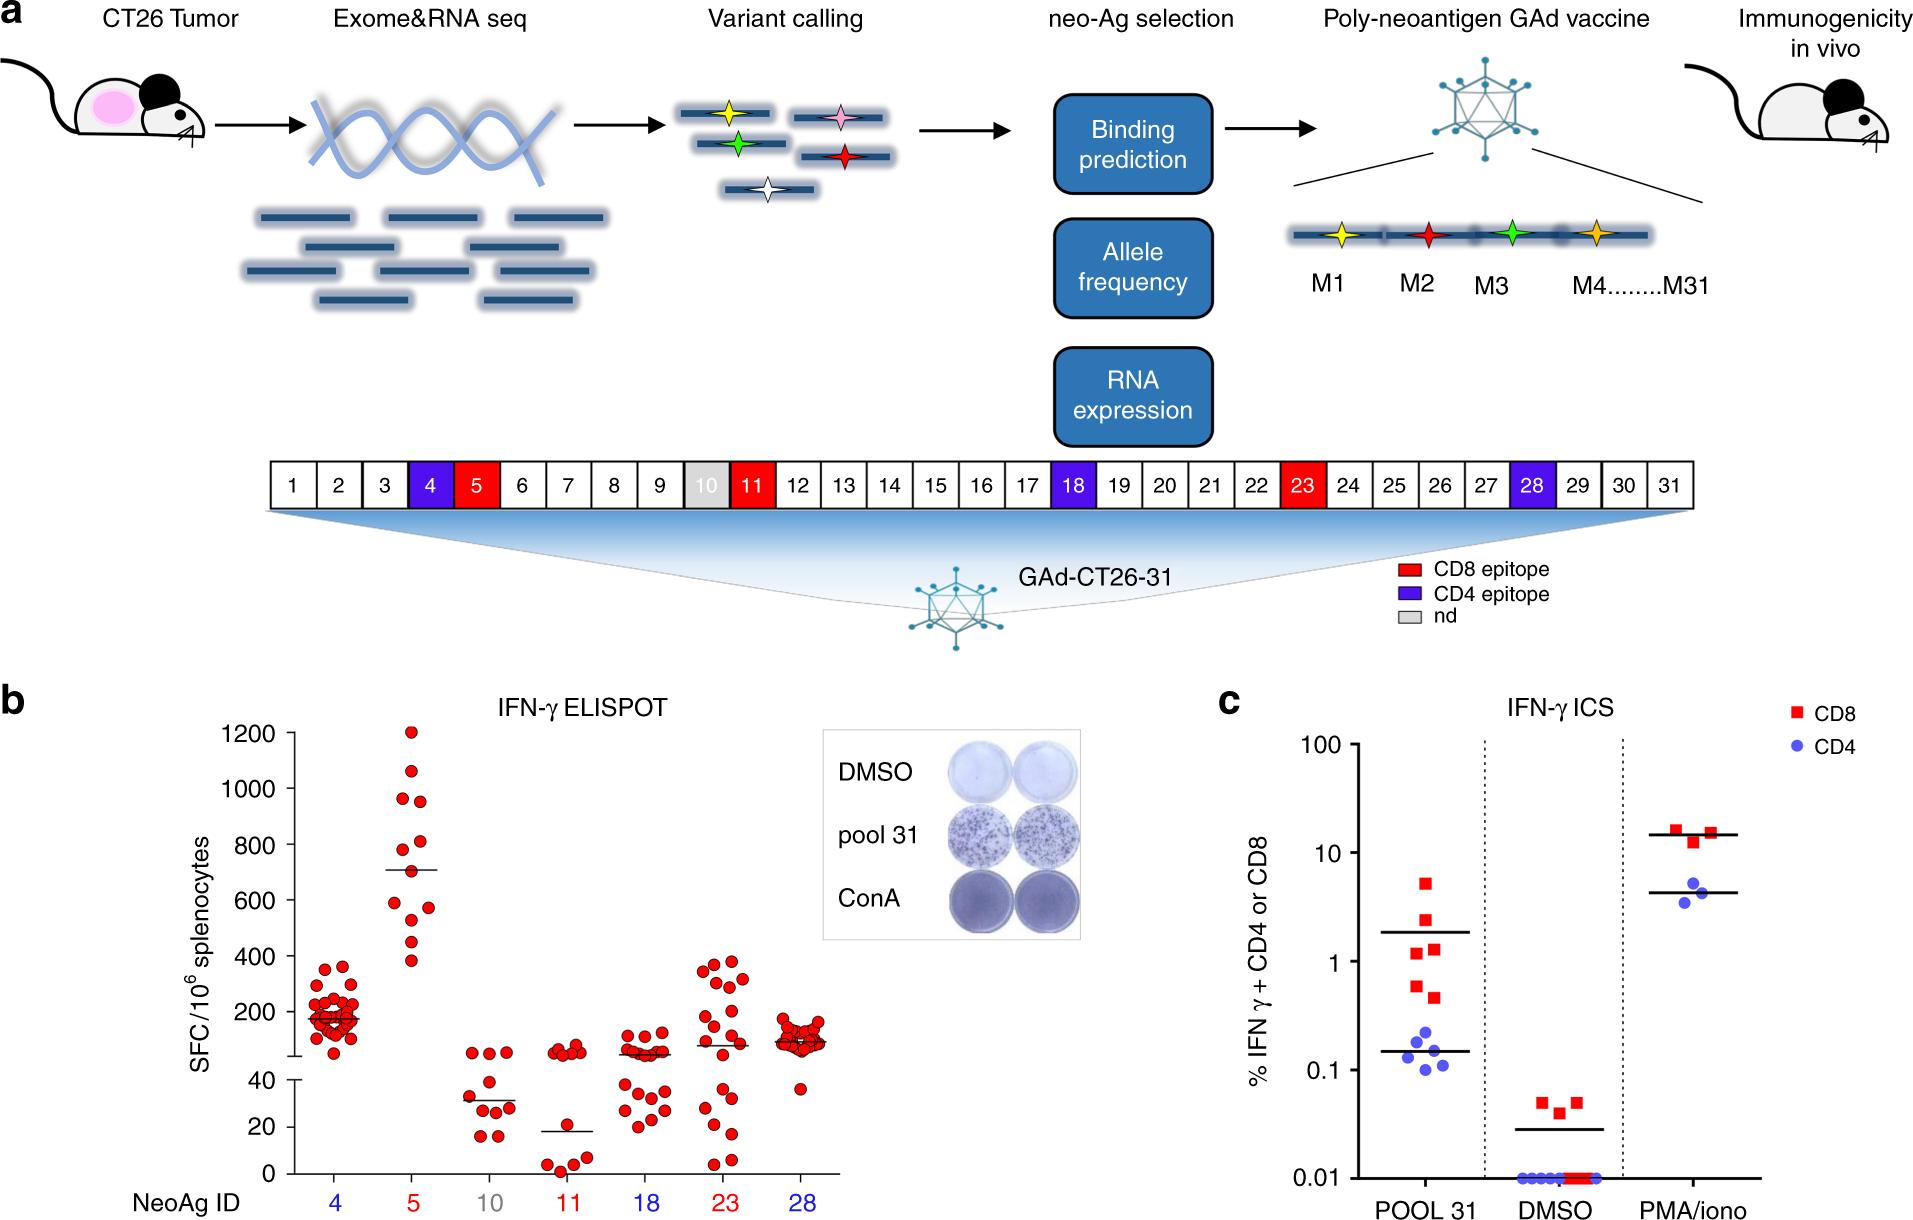 Adenoviral vaccine targeting multiple neoantigens as